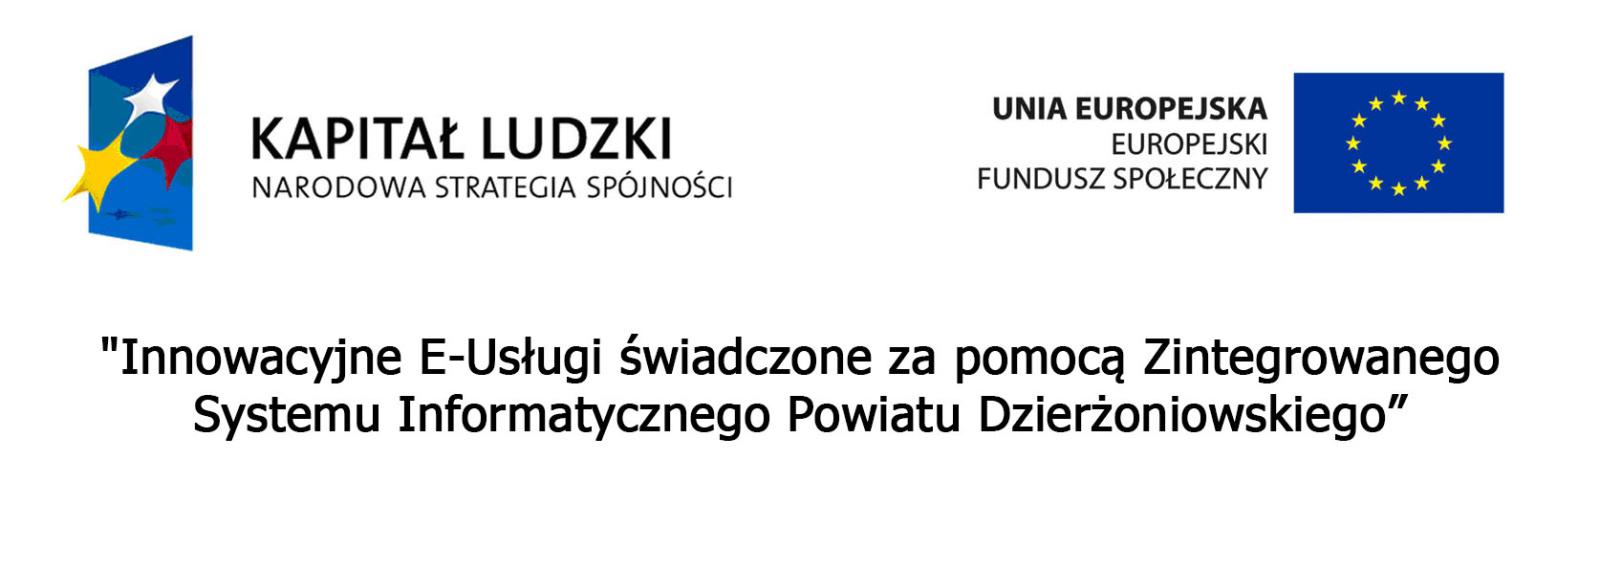 logo_efs_kapital_ludzki2